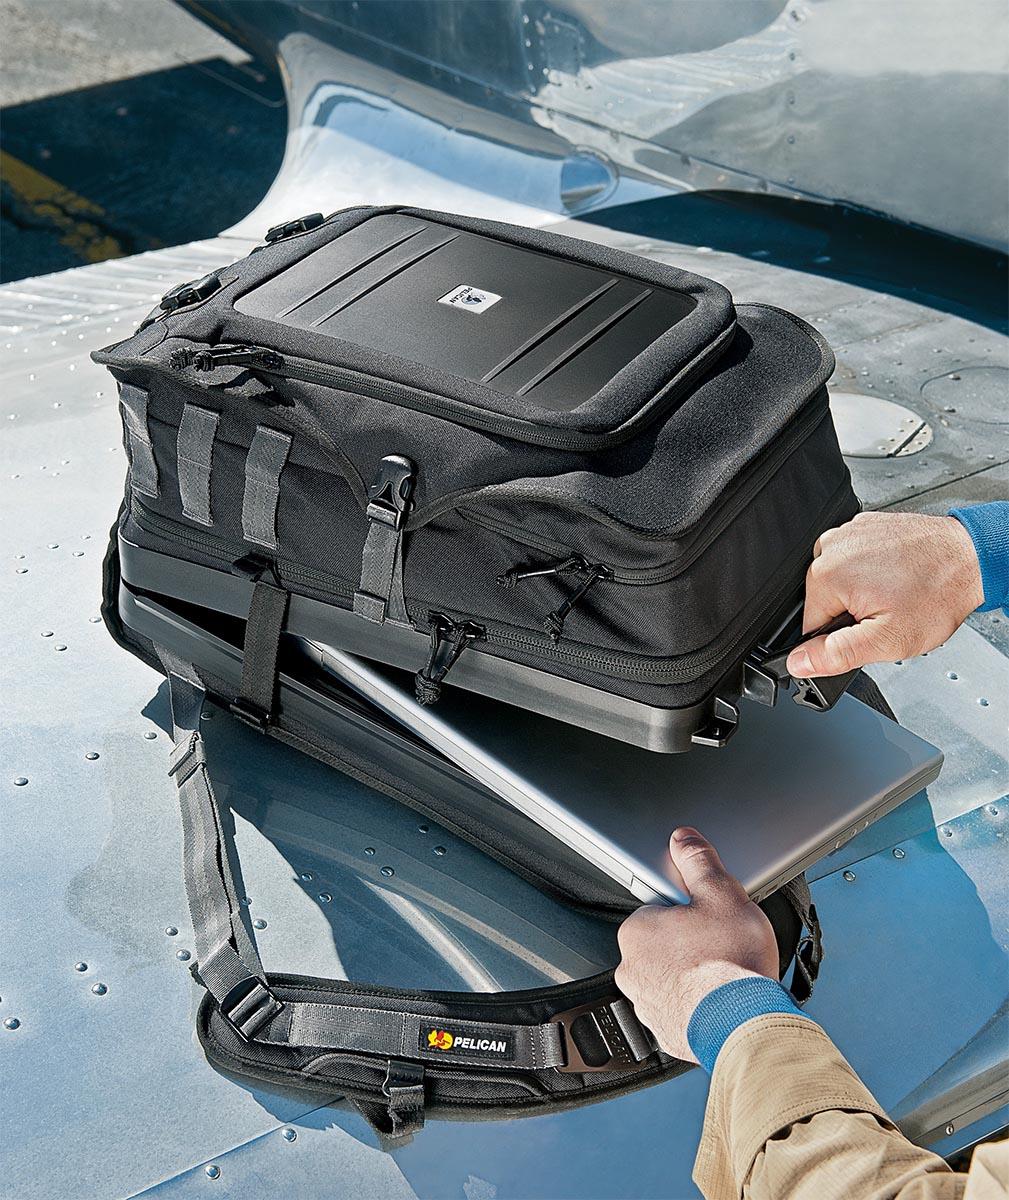 c4a2740d3393 buy pelican backpack u100 best rugged travel laptop bag